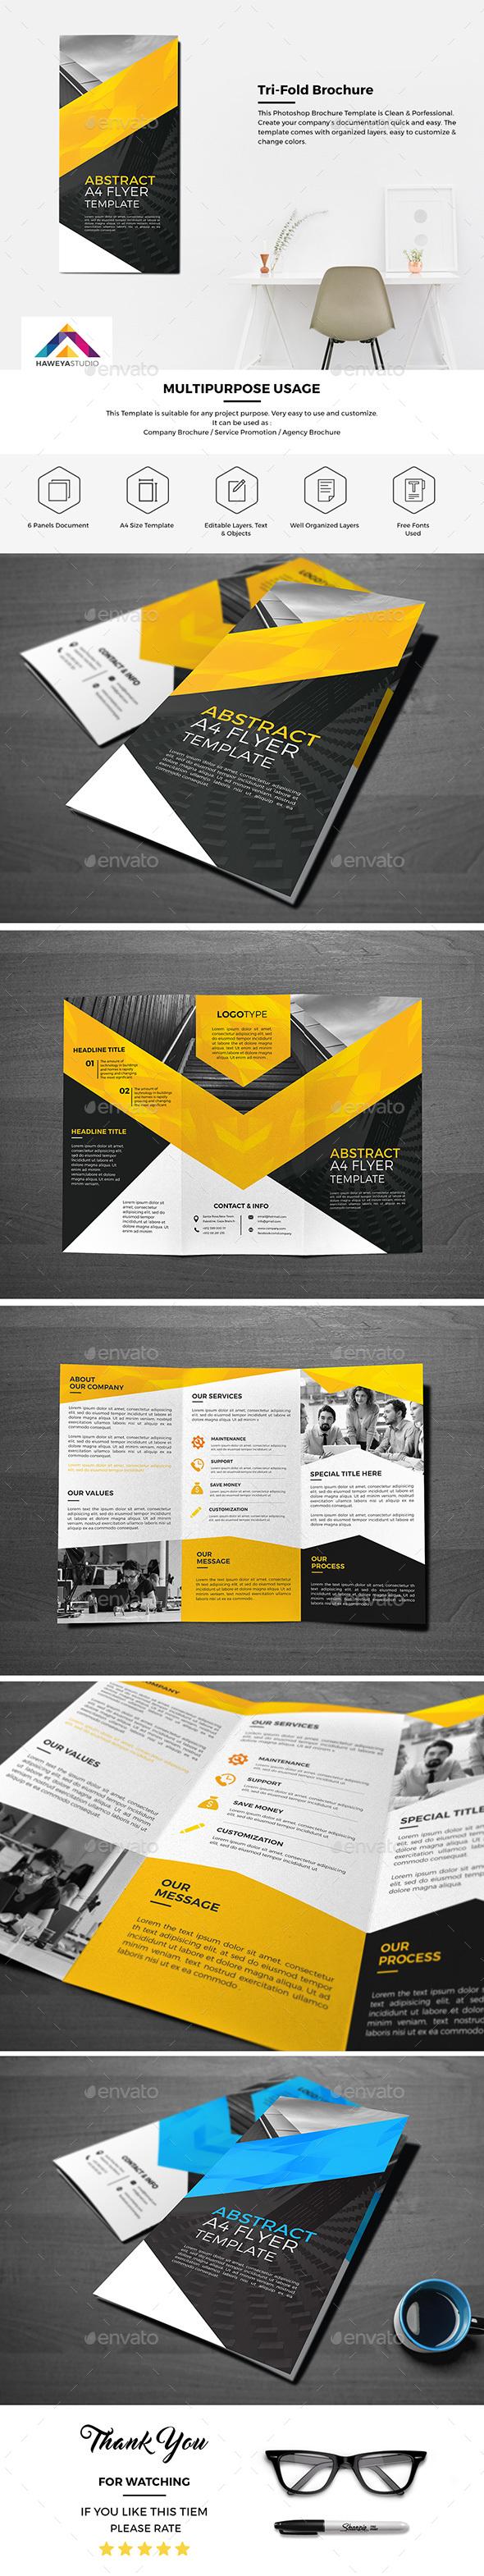 Haweya Tri-Fold Brochure 01  - Corporate Brochures